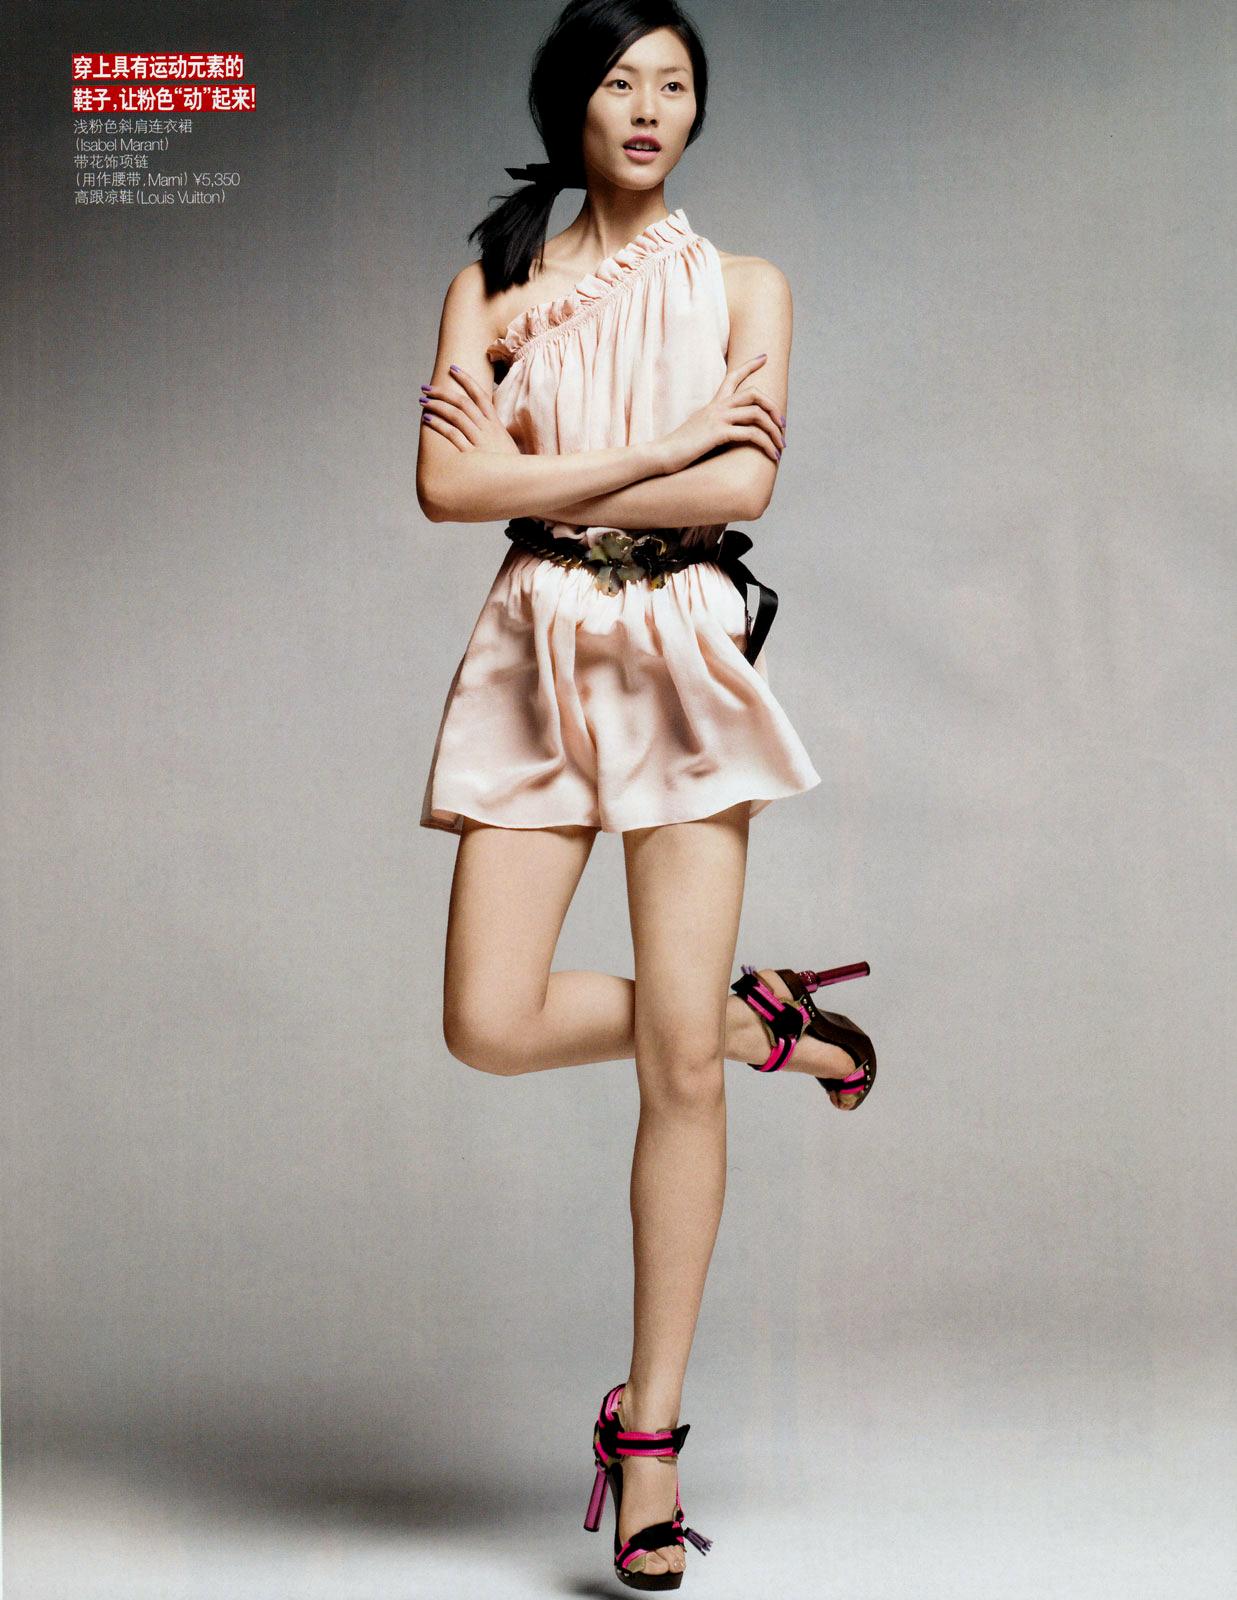 Asian Models Blog Liu Wen Editorial For Vogue China, June